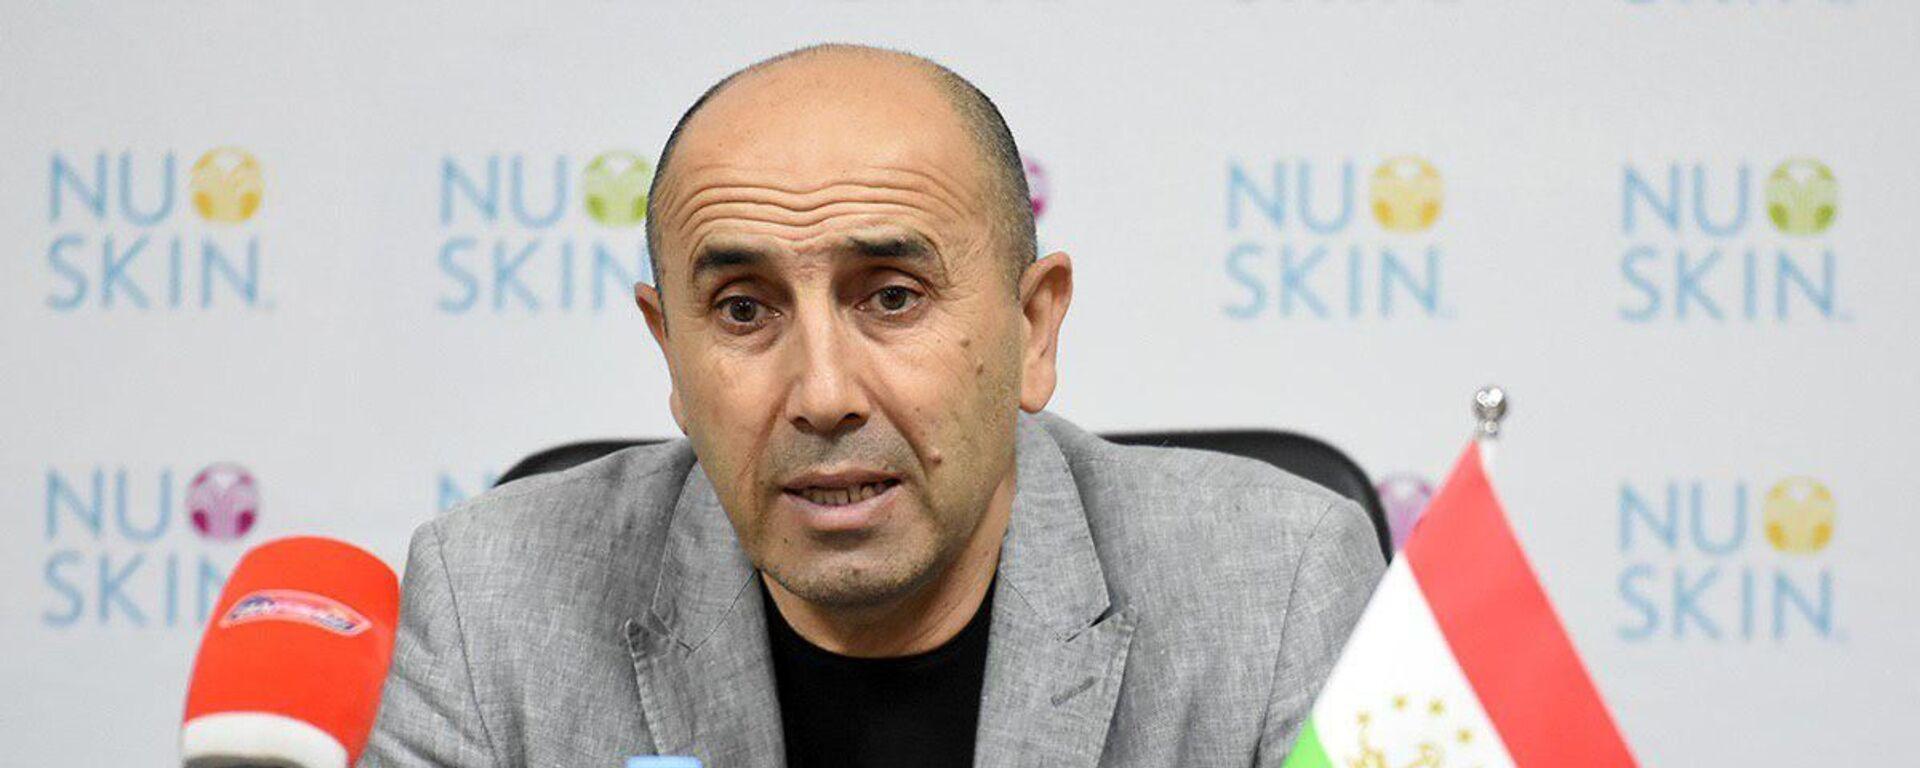 Тренер сборной Таджикистана по футболу Усмон Тошев - Sputnik Таджикистан, 1920, 12.05.2021